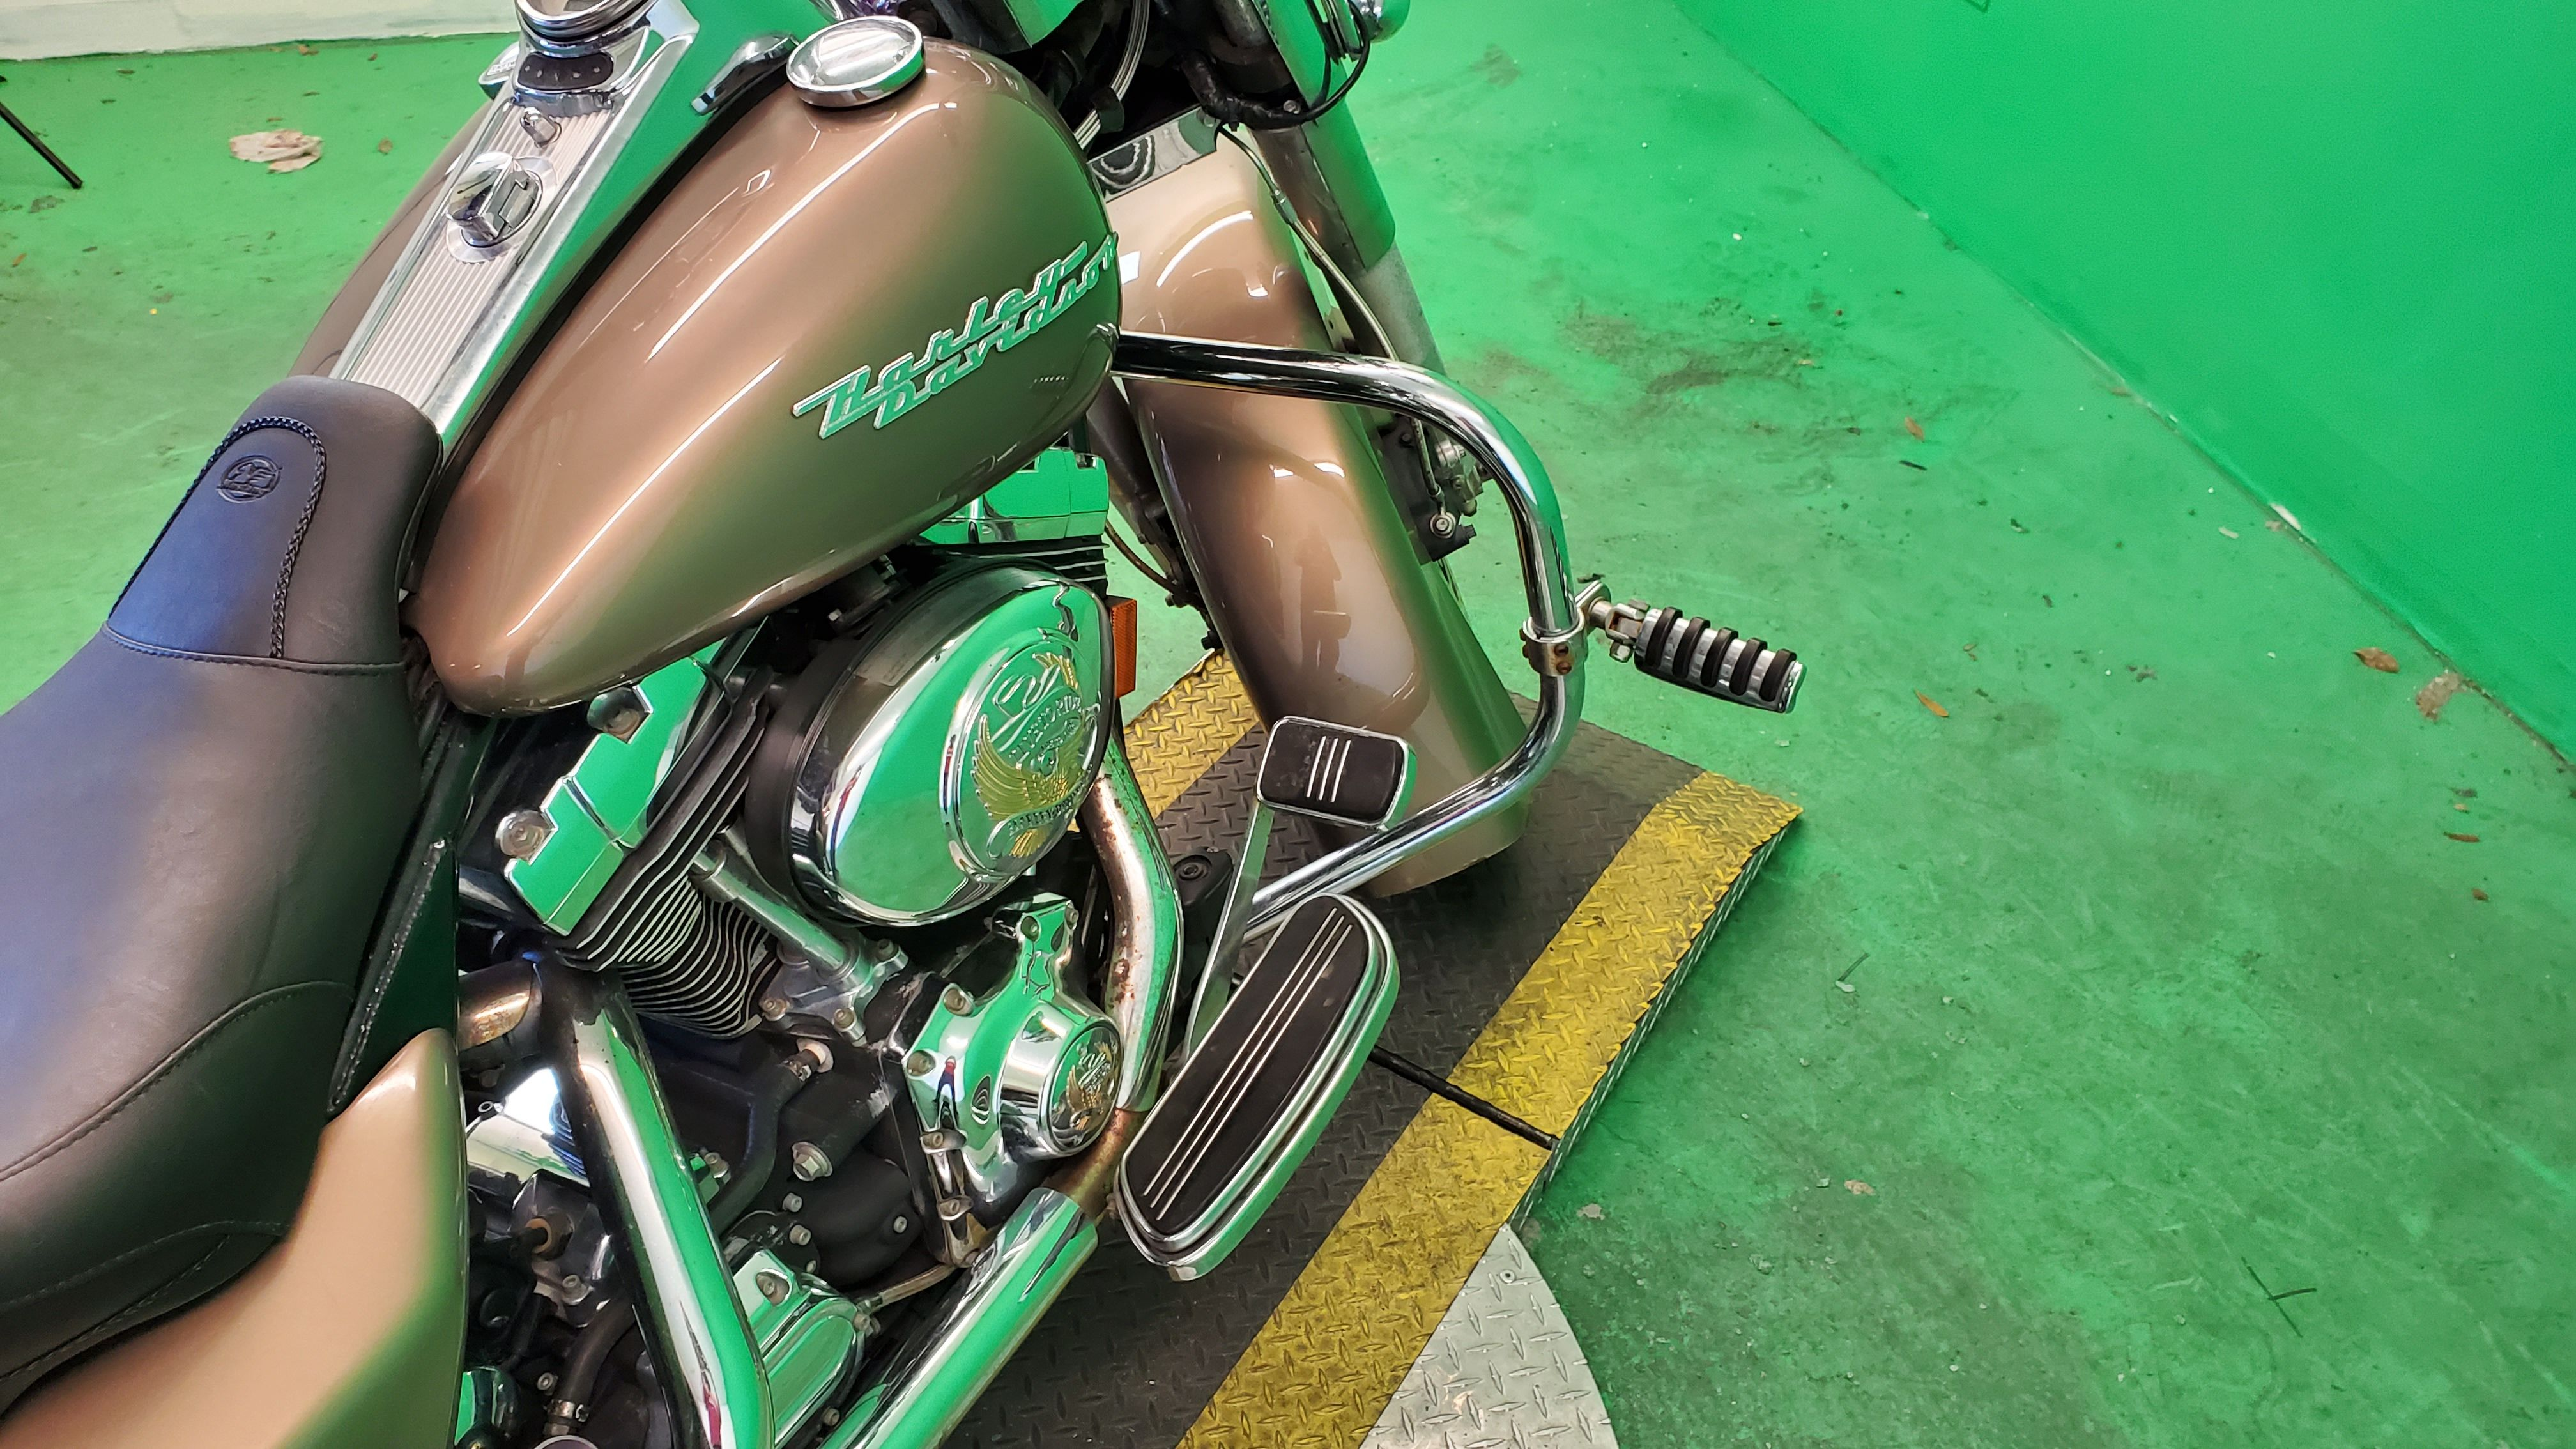 Pre-Owned 2005 Harley-Davidson Road King Custom FLHRS